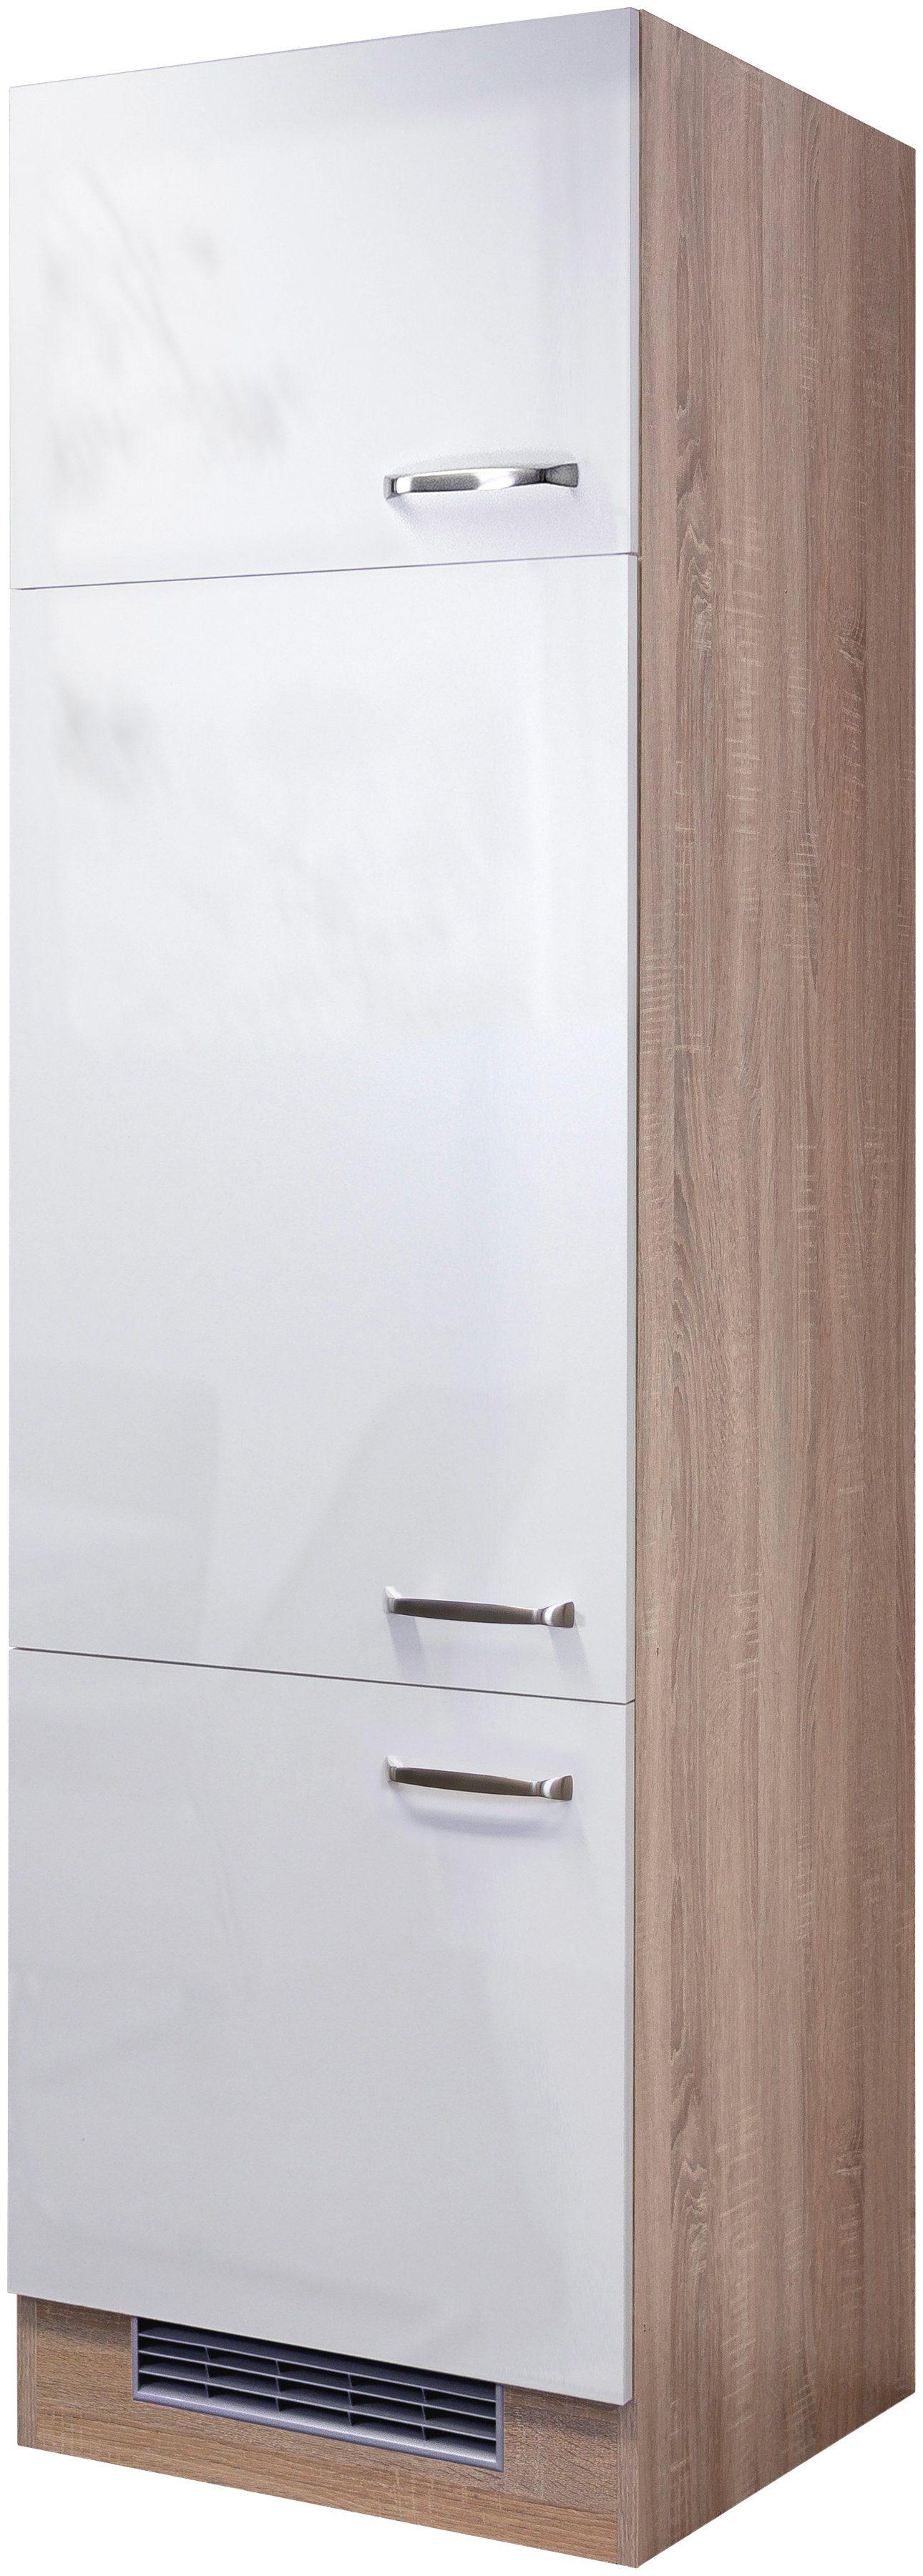 Kühlumbauschrank »Florenz«, Höhe 200 cm